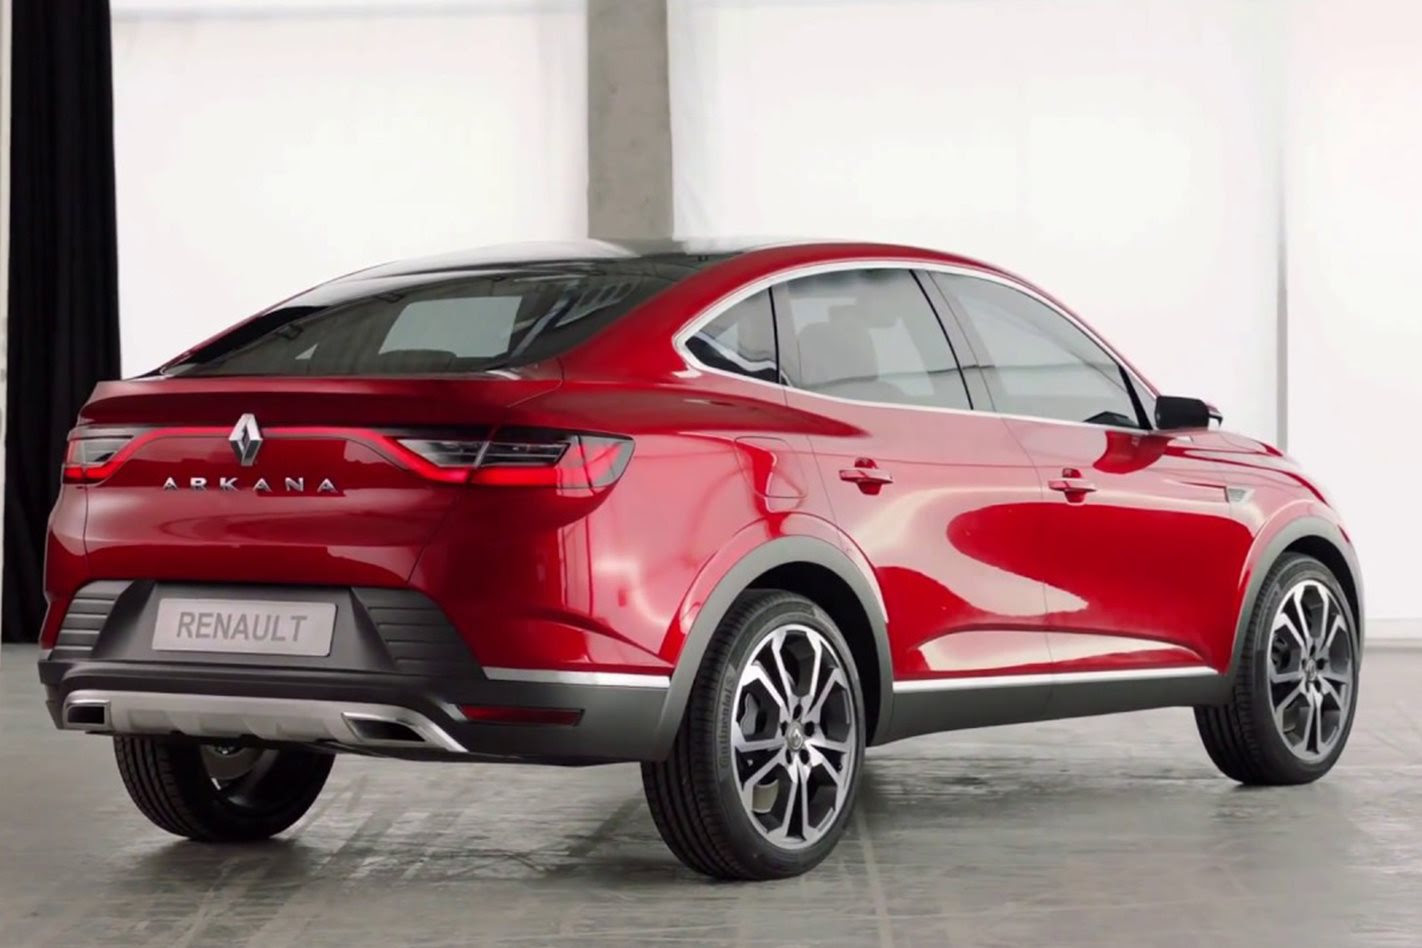 Renault Arkana Being Considered For Australian Market